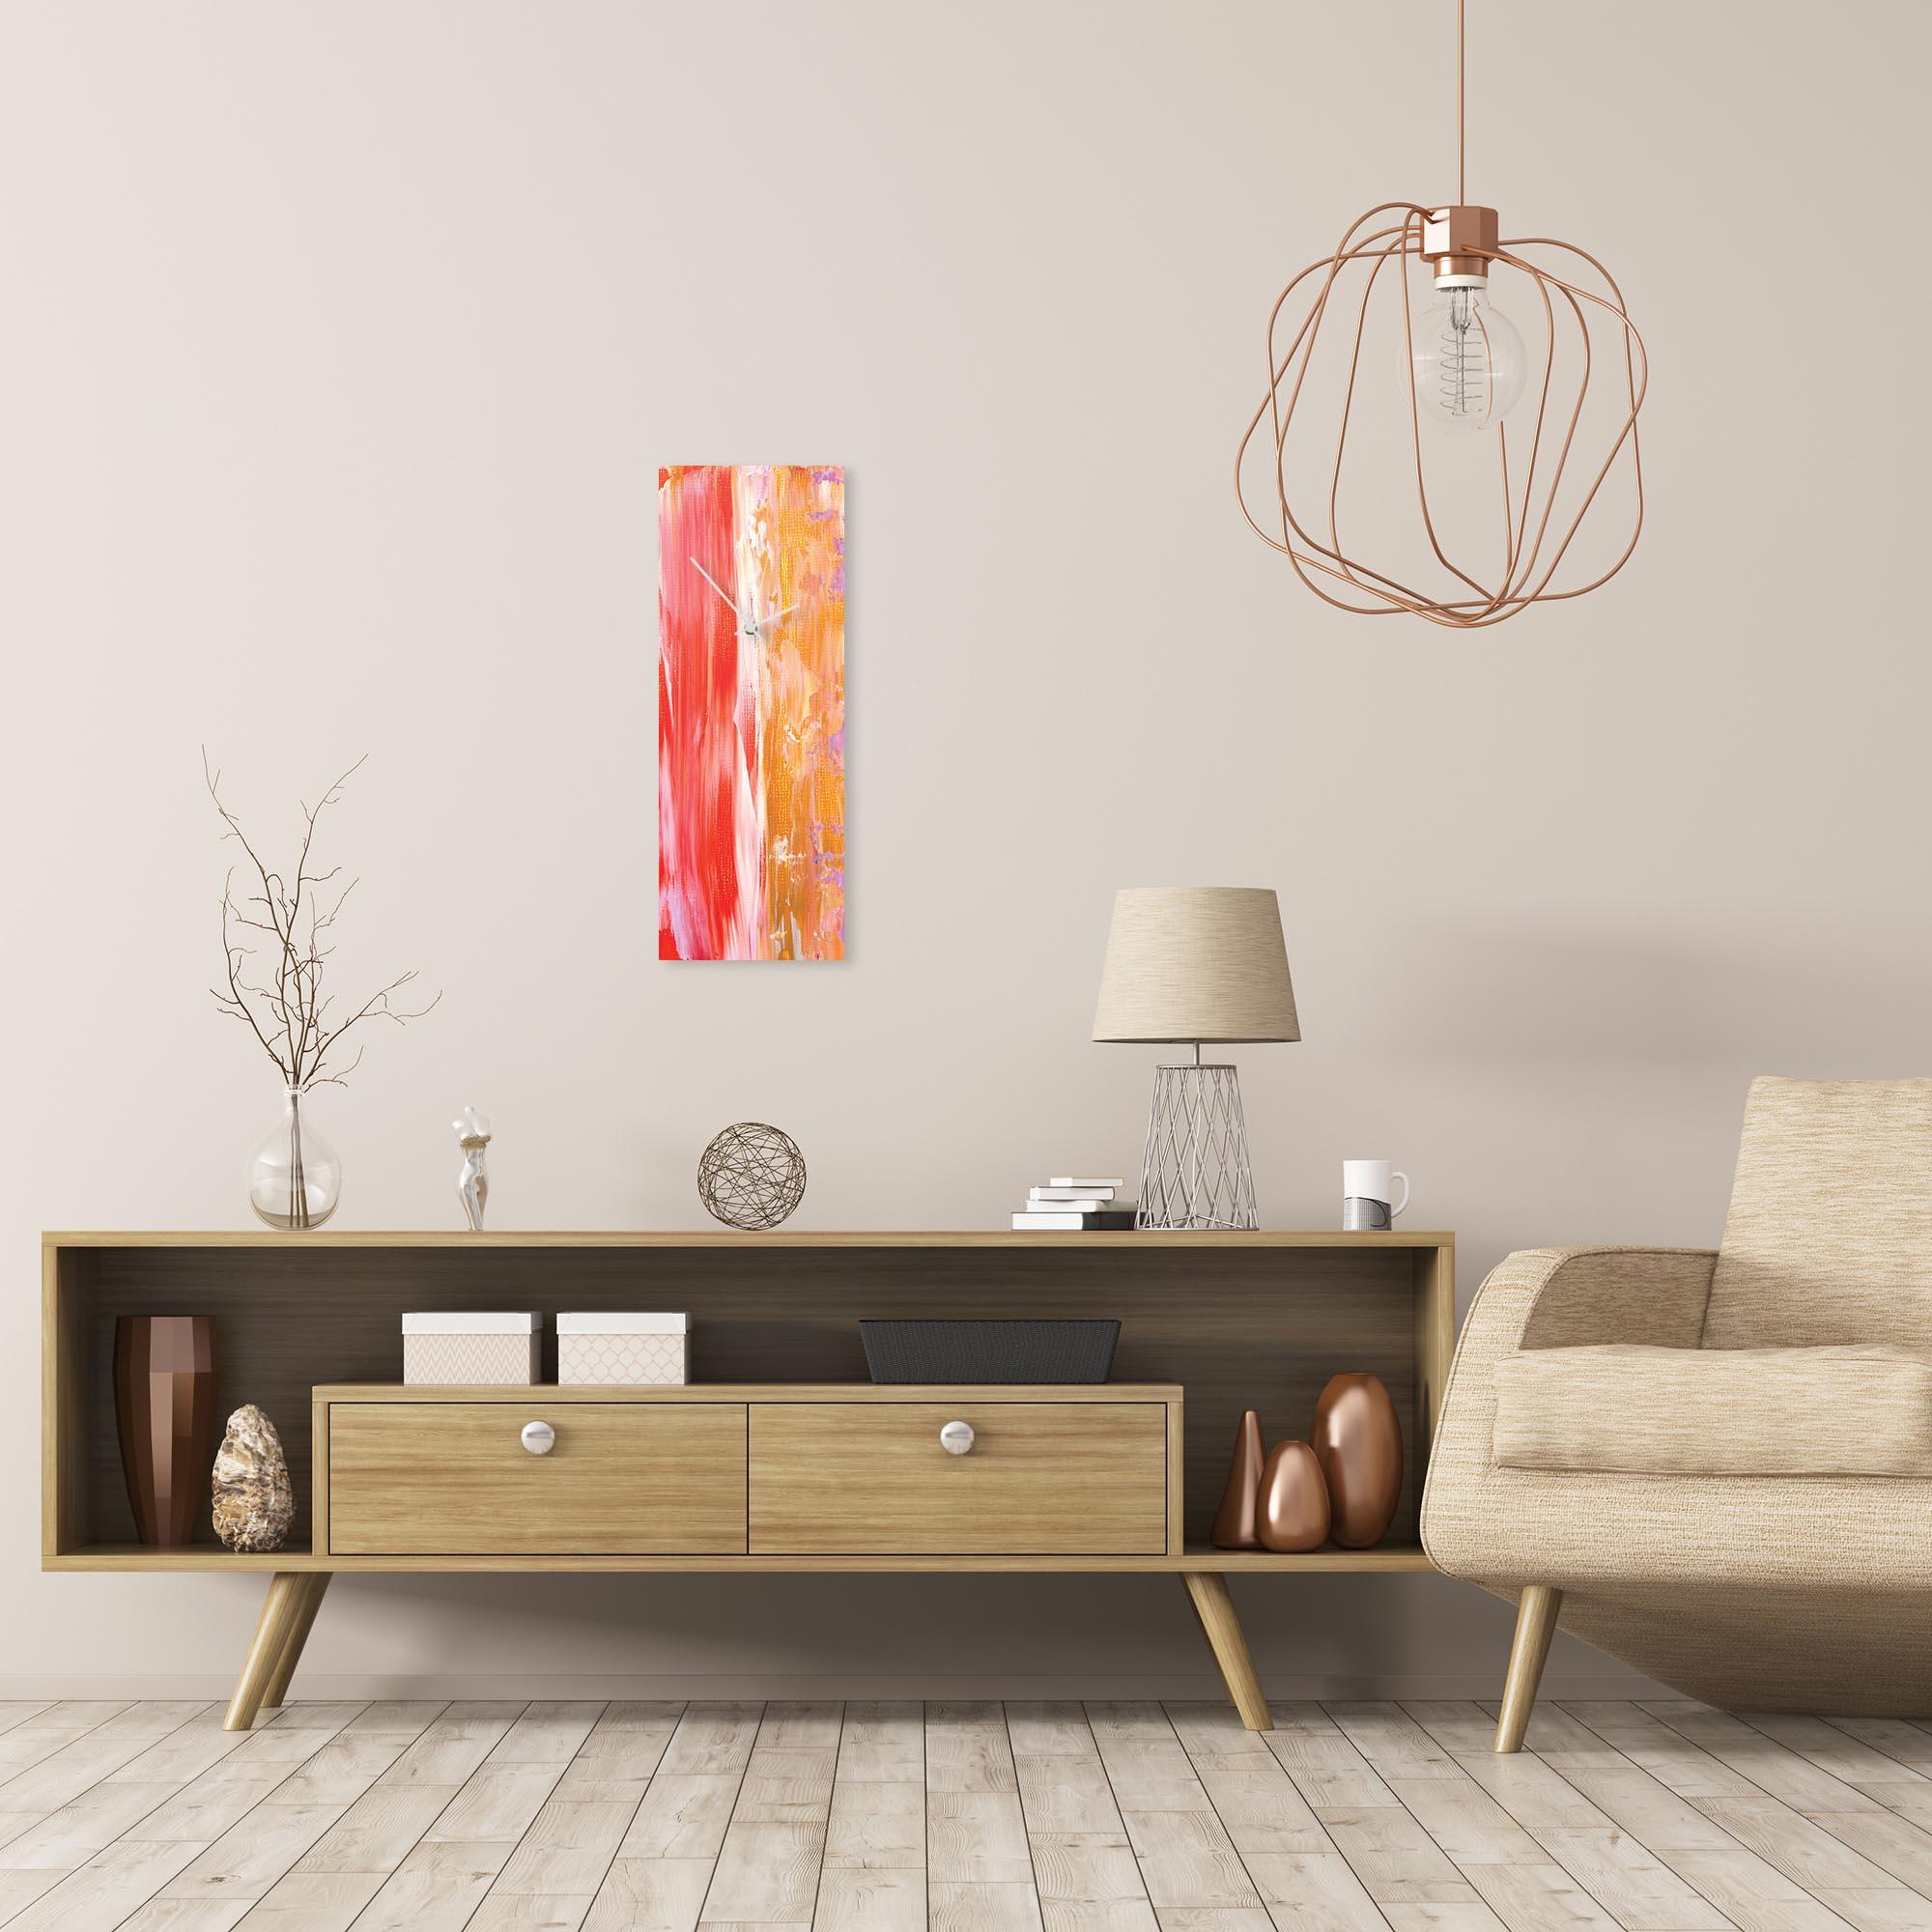 Urban Warmth v5 Clock Large by Celeste Reiter Modern Wall Clock on Metal - Alternate View 1